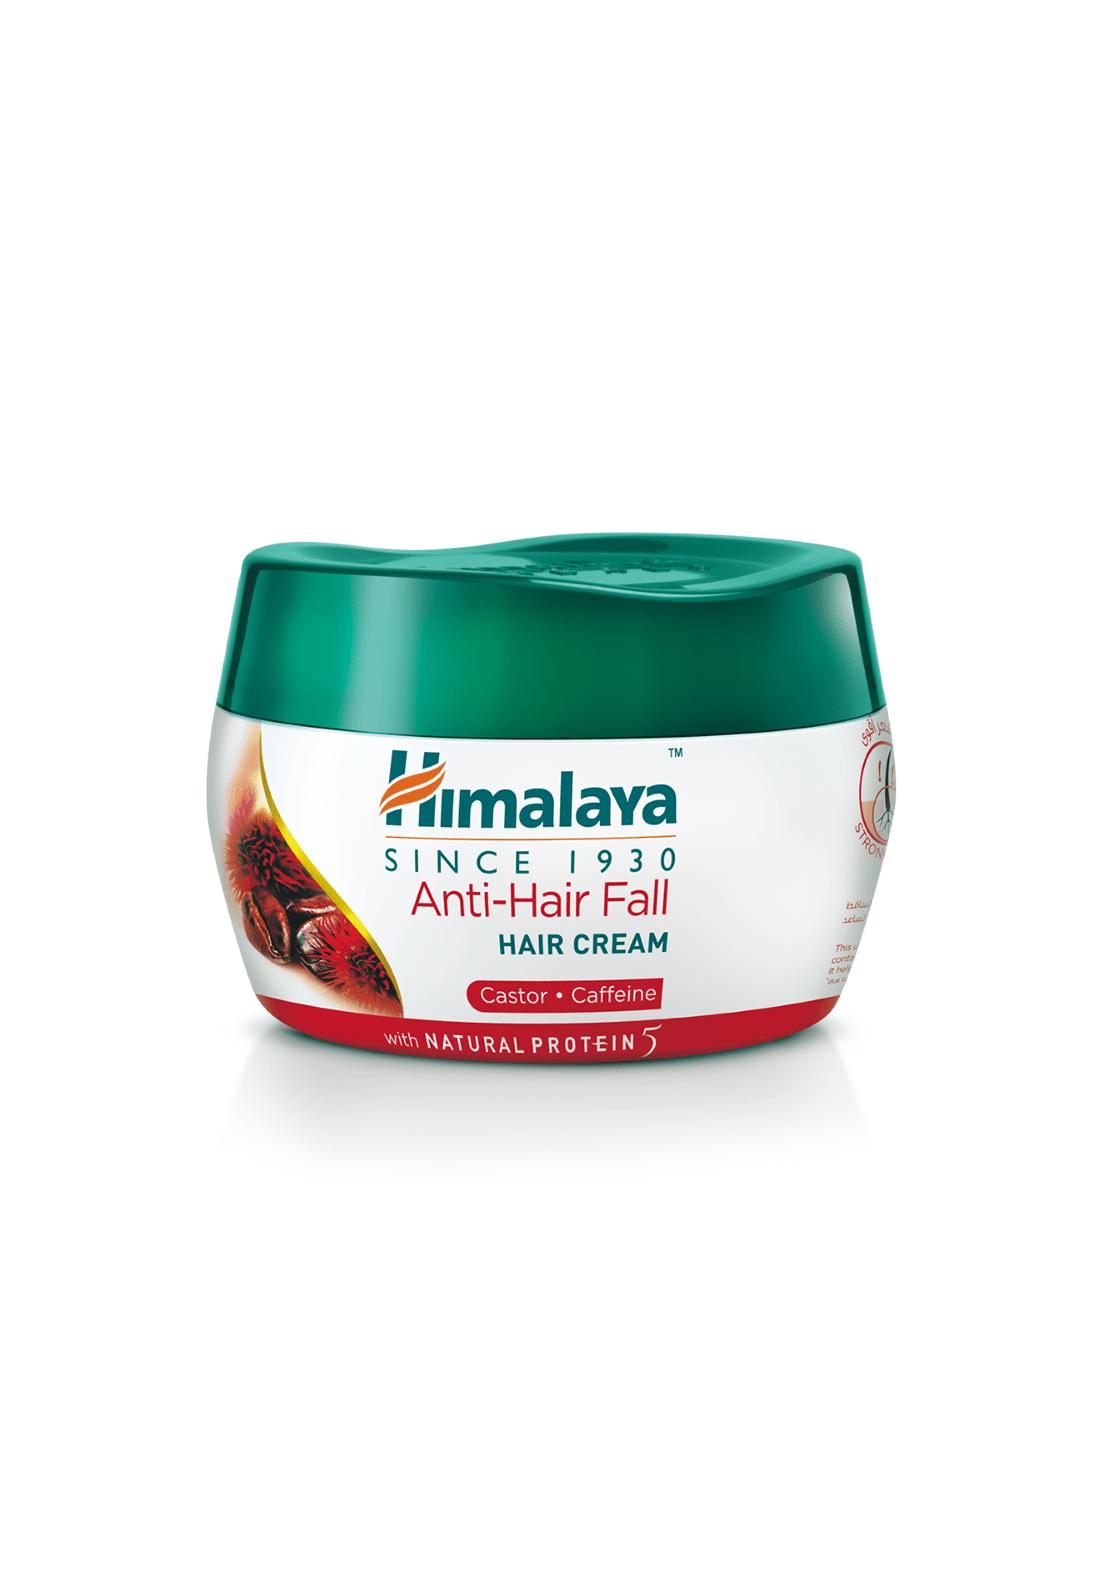 Hair Cream - Anti-Hair Fall Hair Cream هيمالايا كريم ضد تساقط الشعر 210 مل